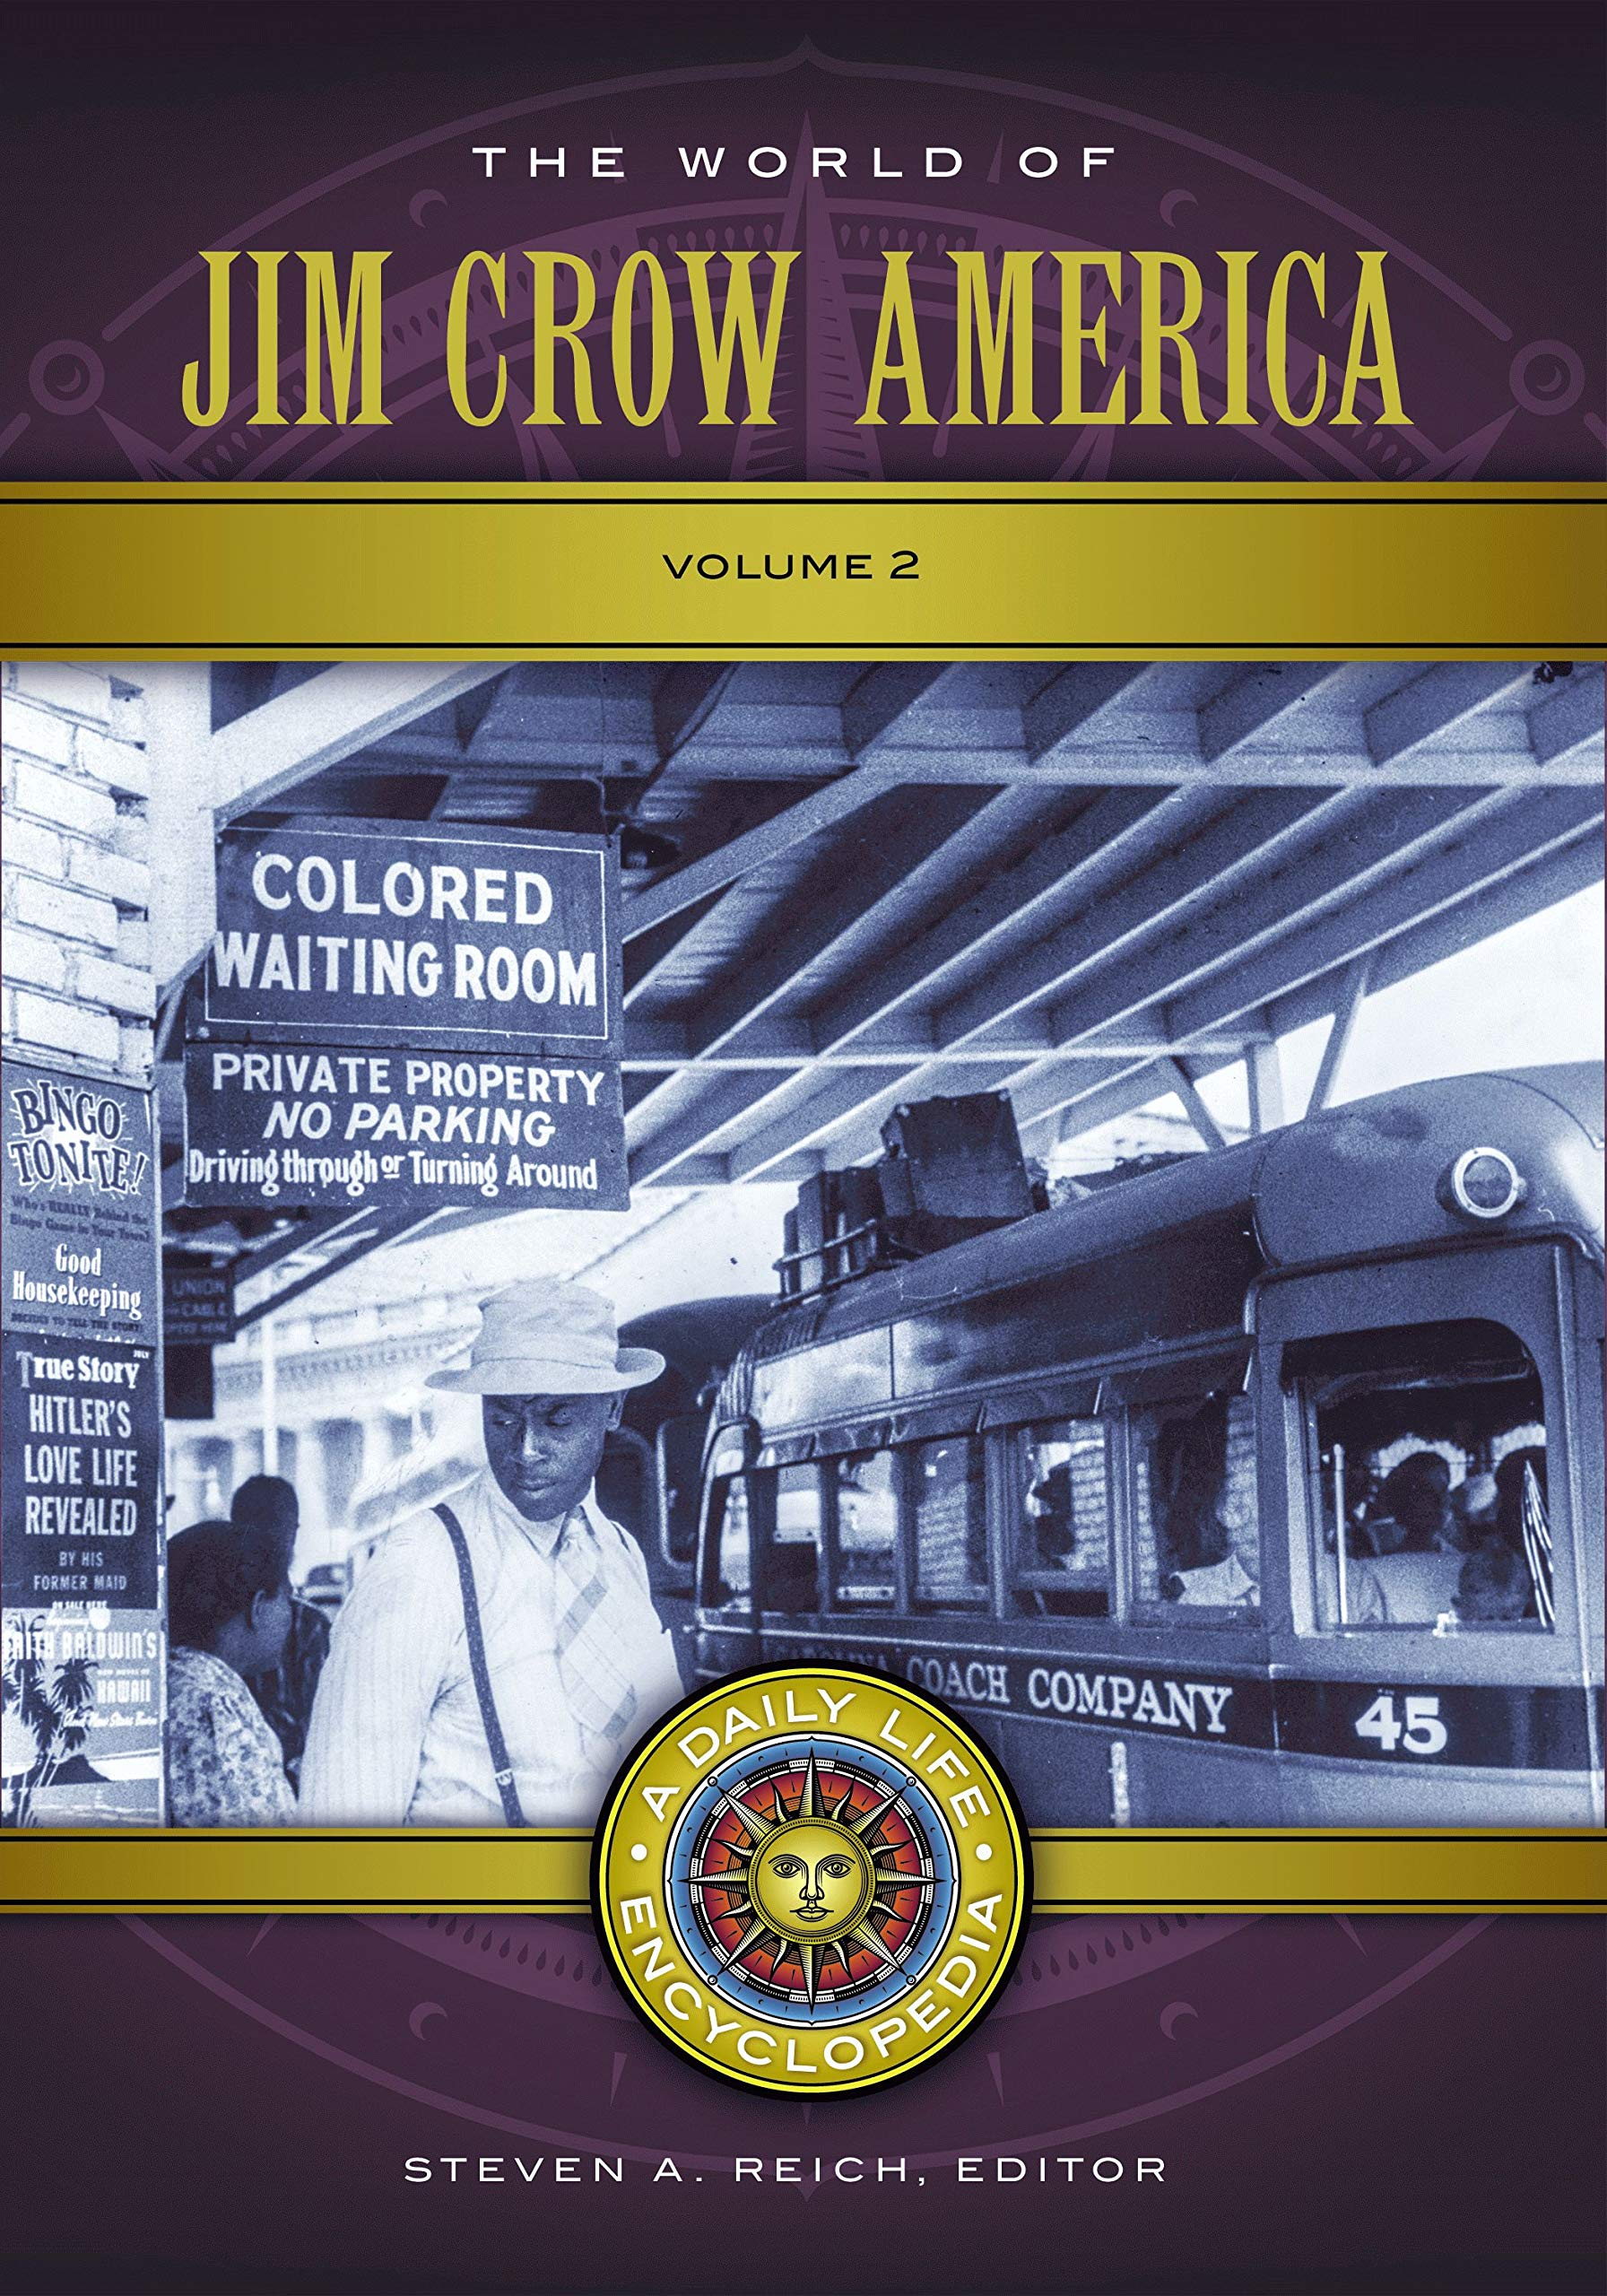 The World of Jim Crow America: ADaily Life Encyclopedia